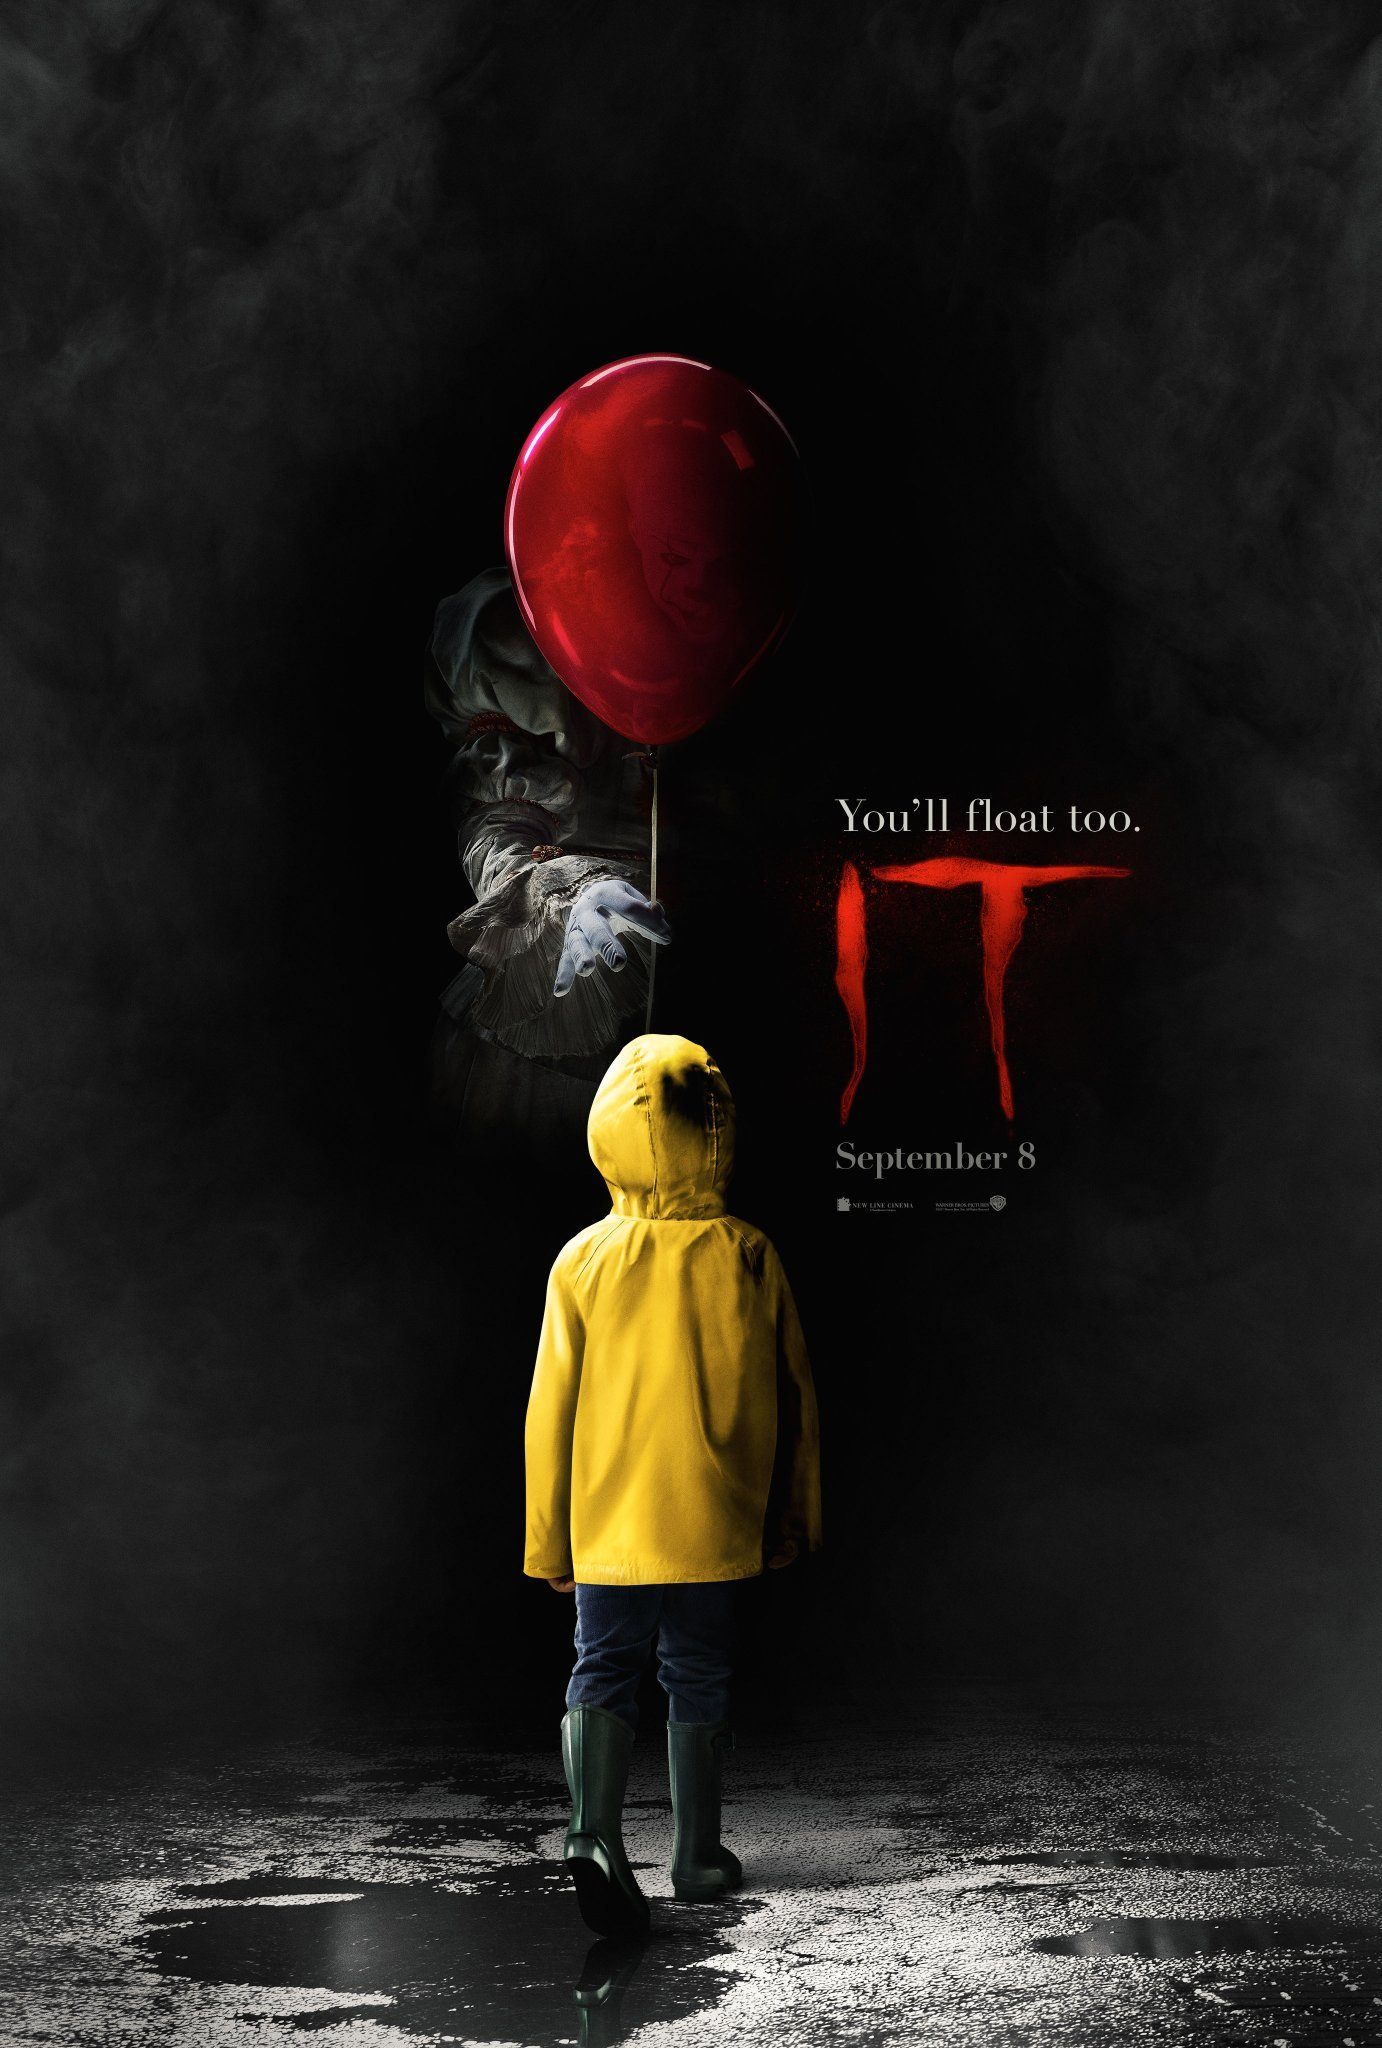 It-movie-poster.jpg